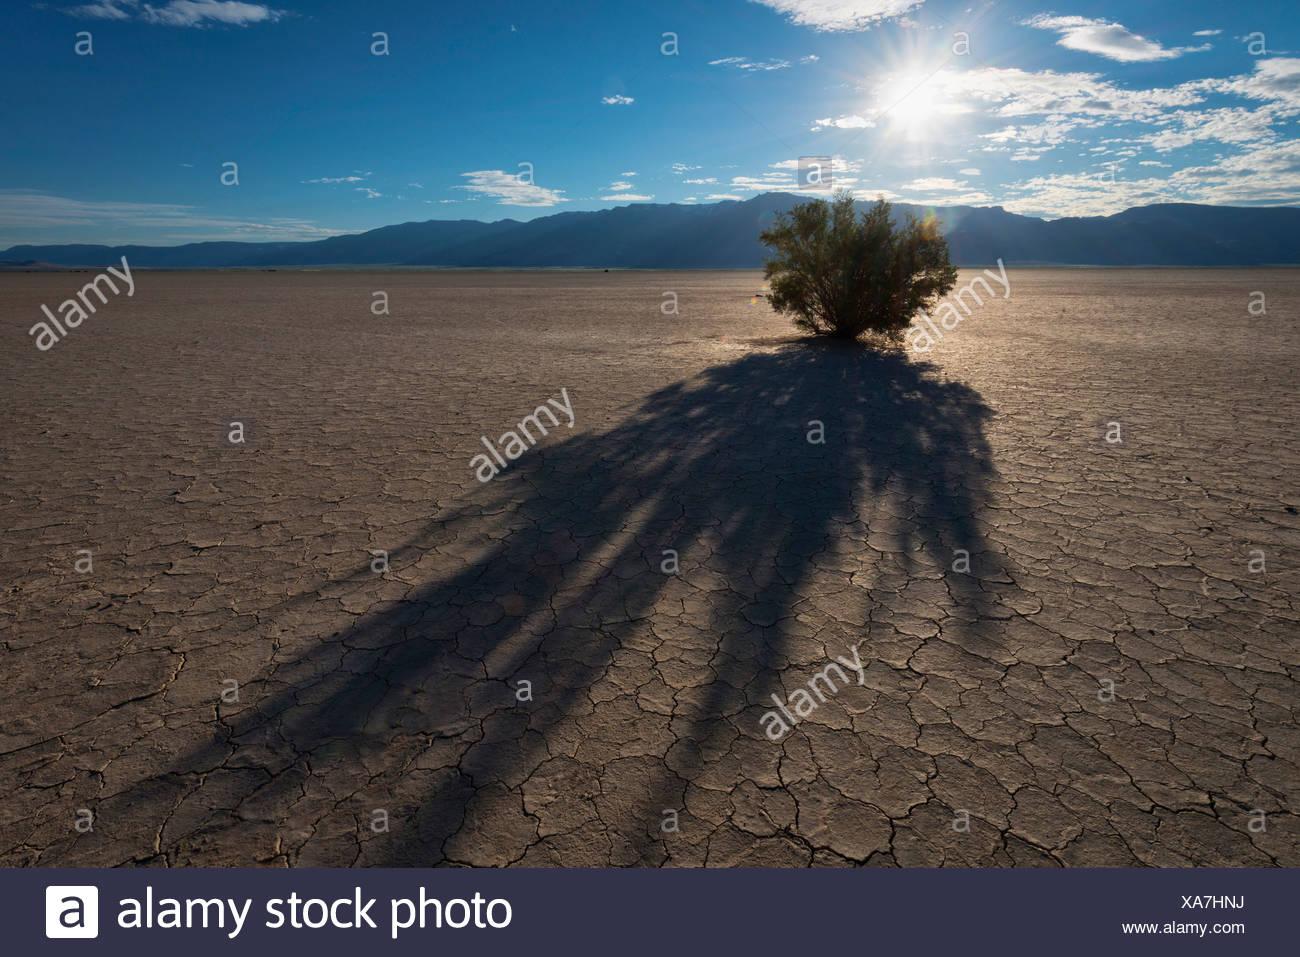 USA, Oregon, Harney County, Alvord Desert at sunset - Stock Image